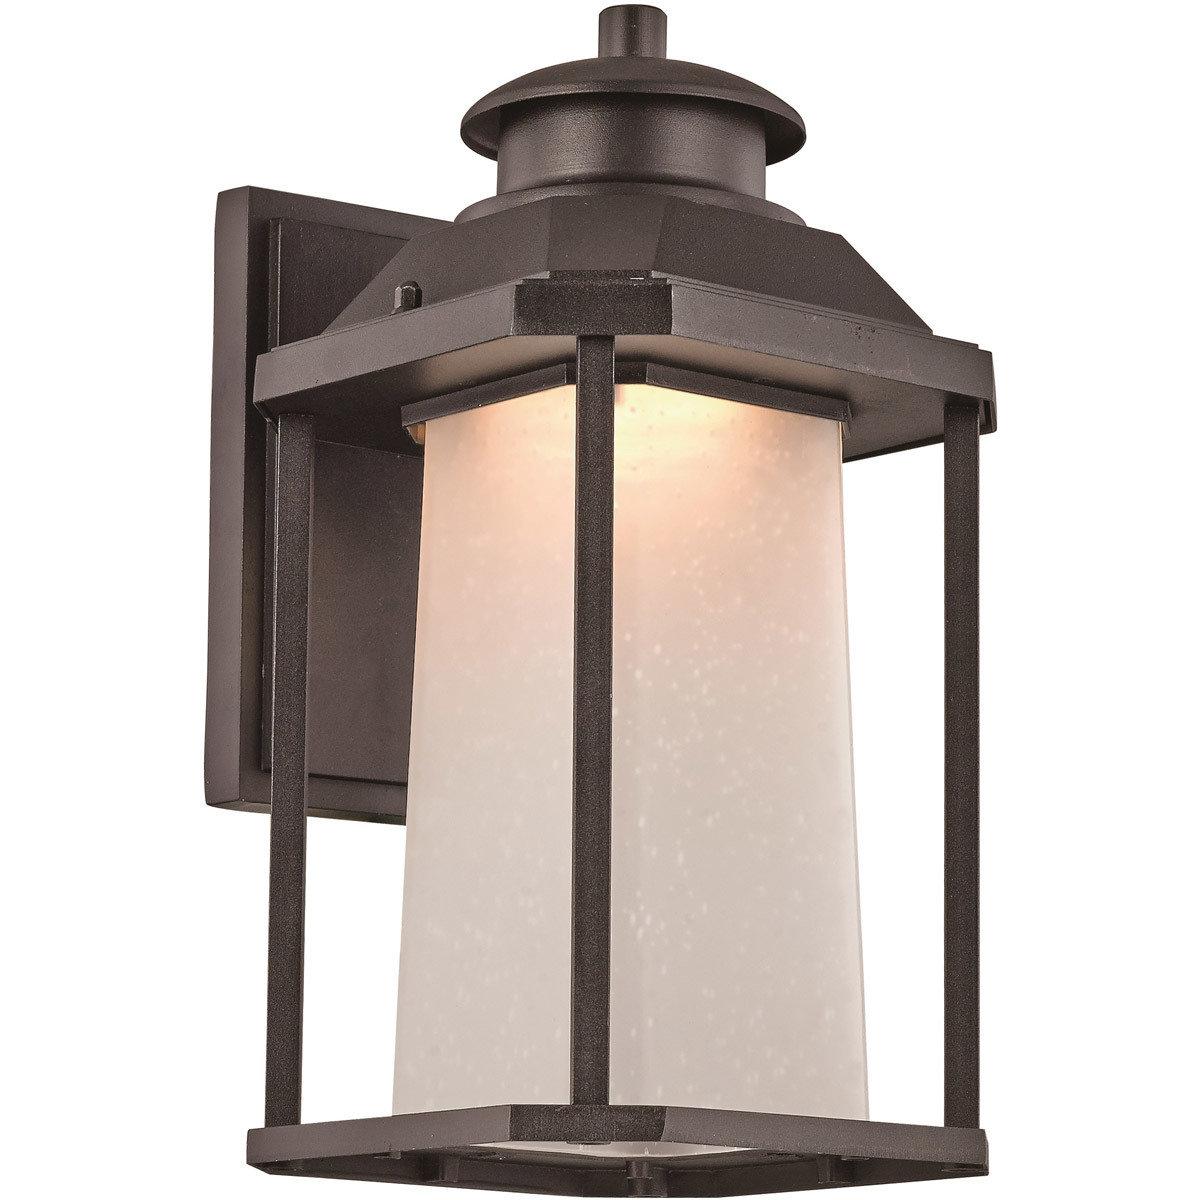 Southfield Black LED Wall Lantern T-106897